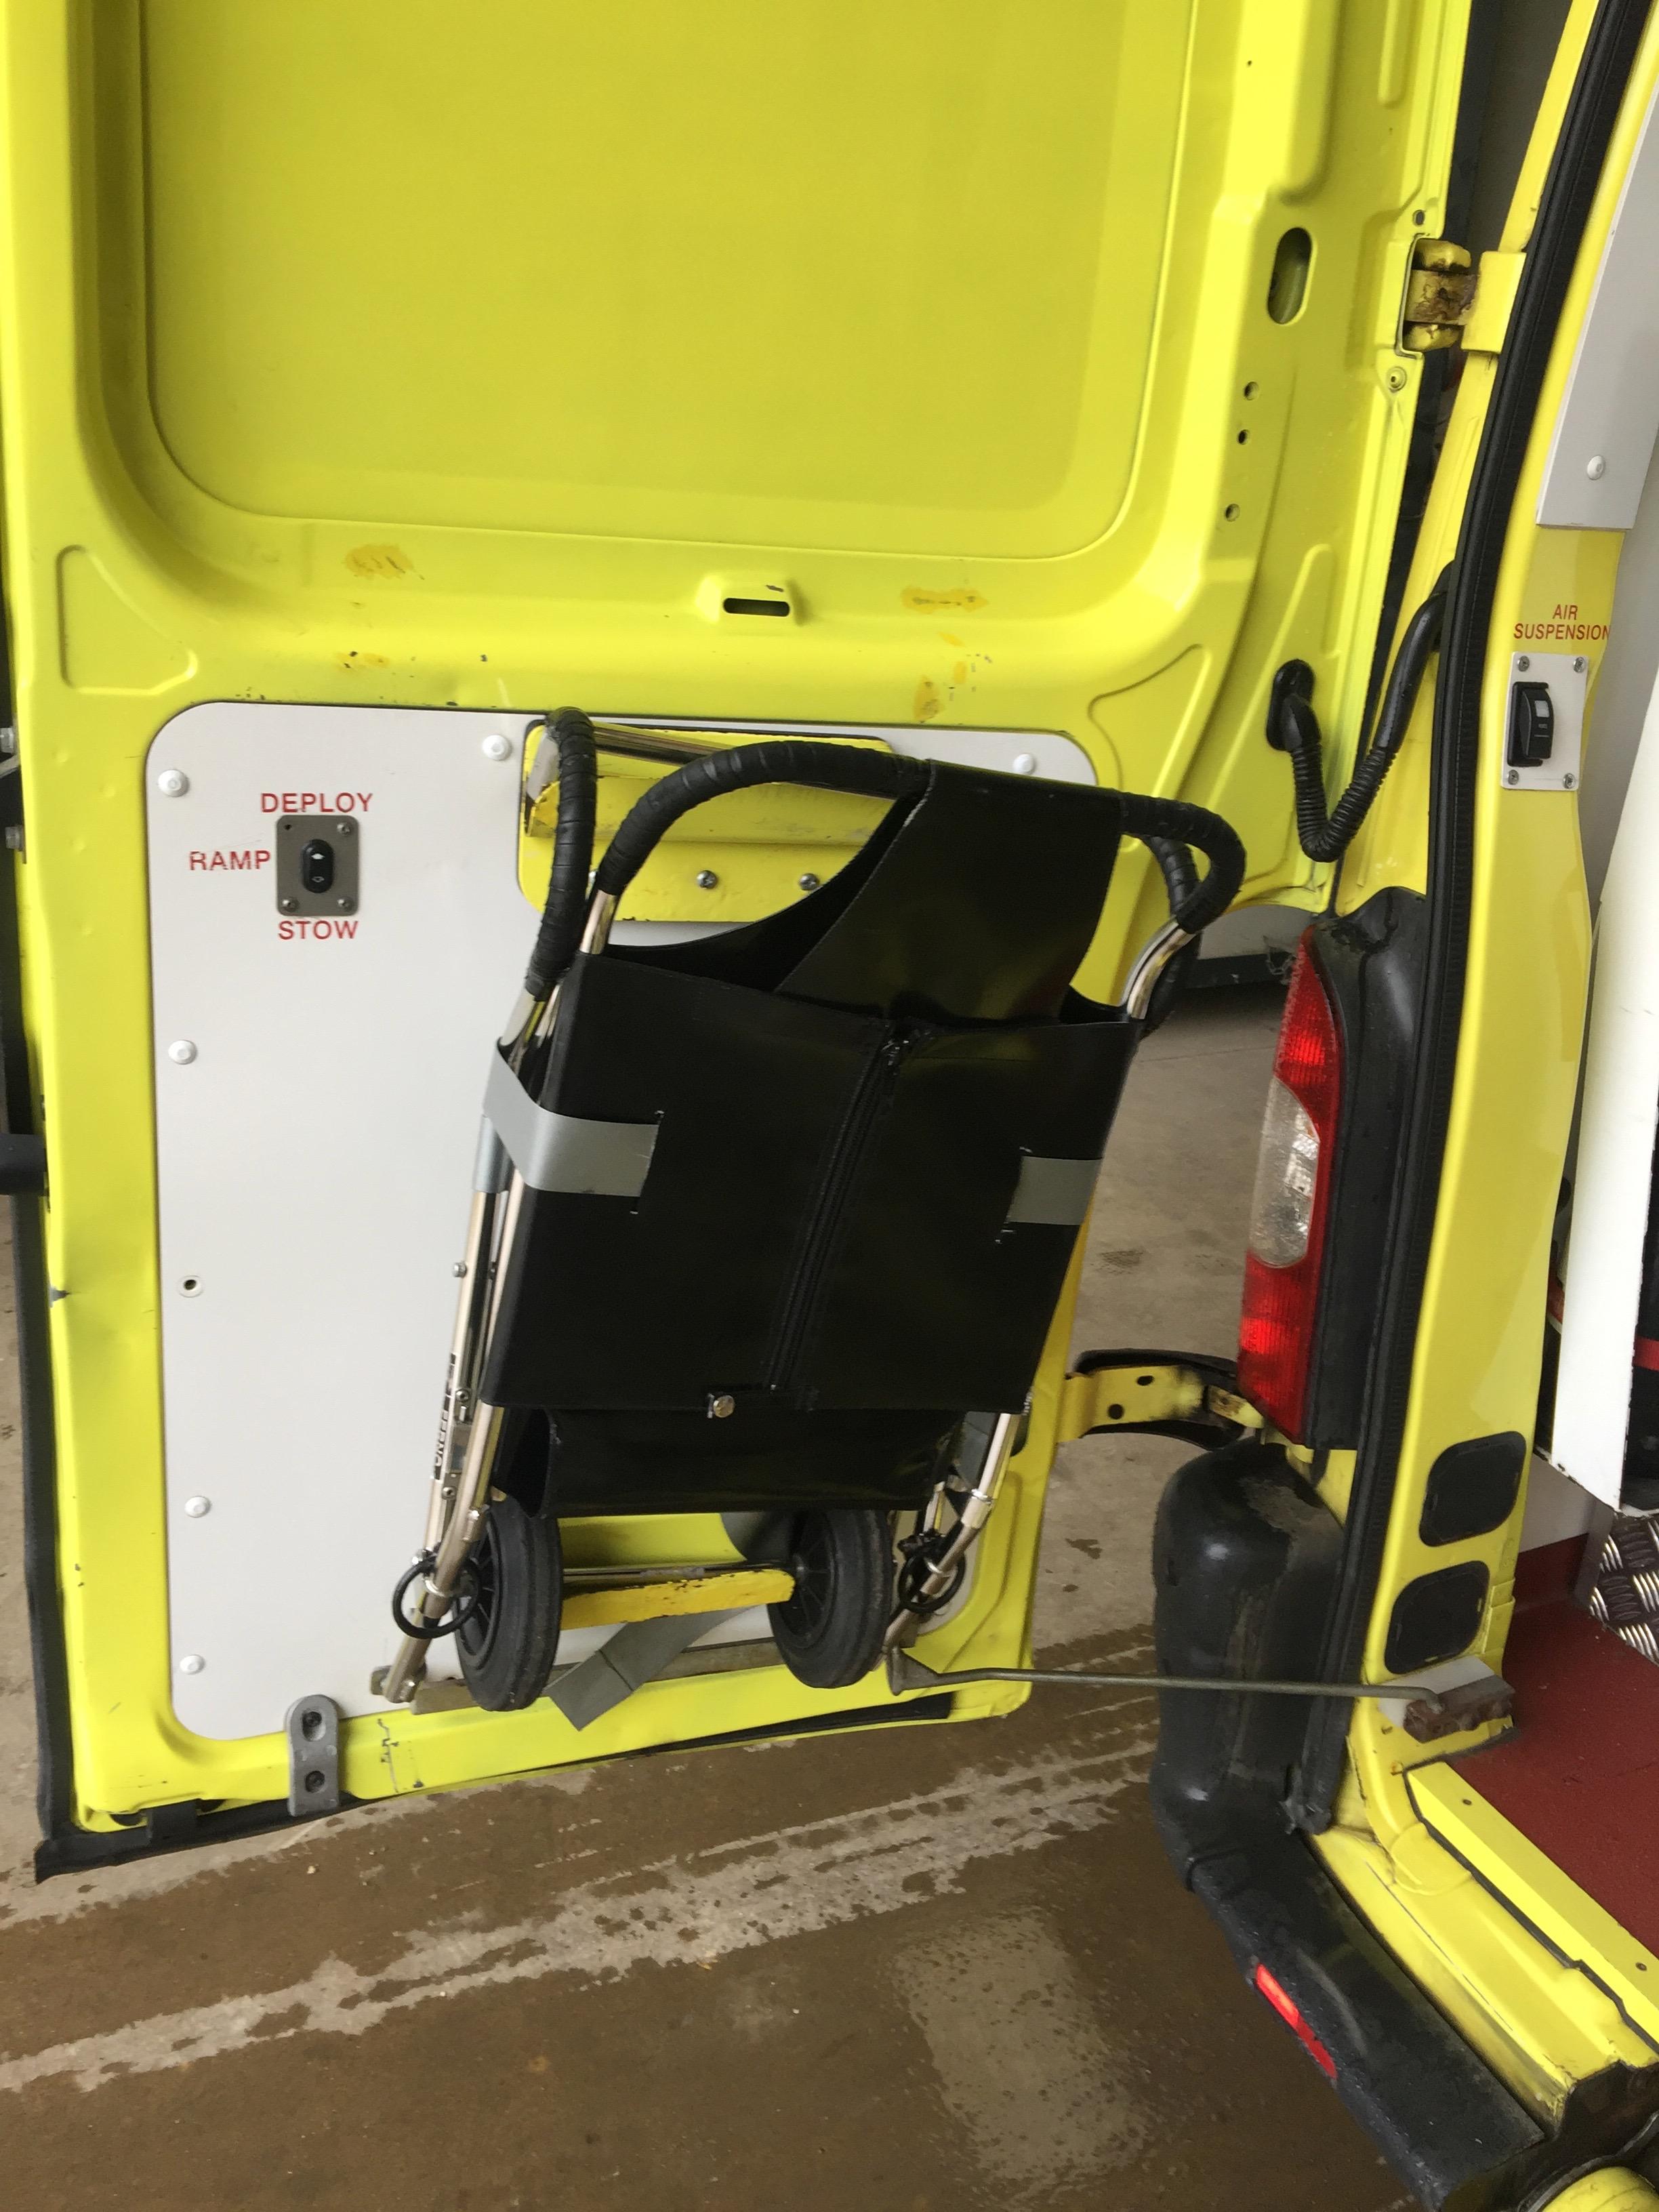 Lot 3 - Renault Master standard body HDU ambulance Registration No PK59 OGZ, 190855 recorded miles, date